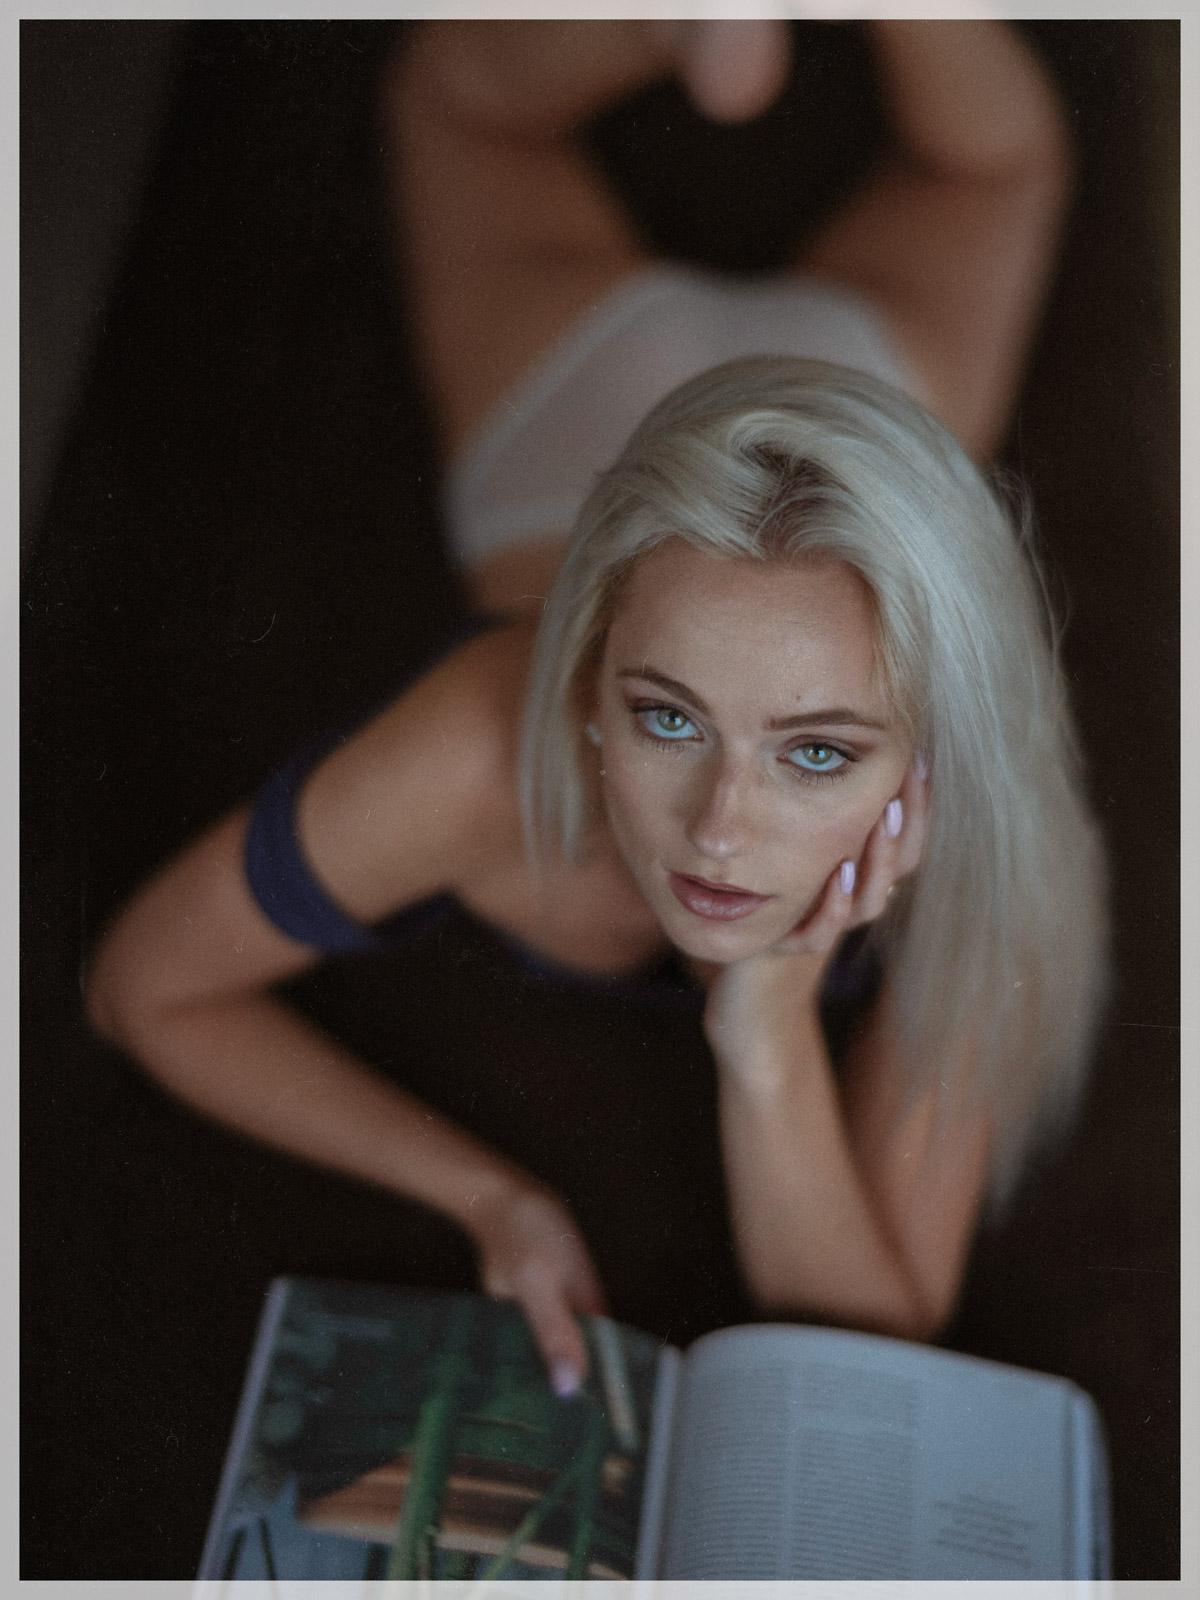 Anais Jeanneret Photo Lui a sexy corner: catrina shank desnuda para juan garcia (junio